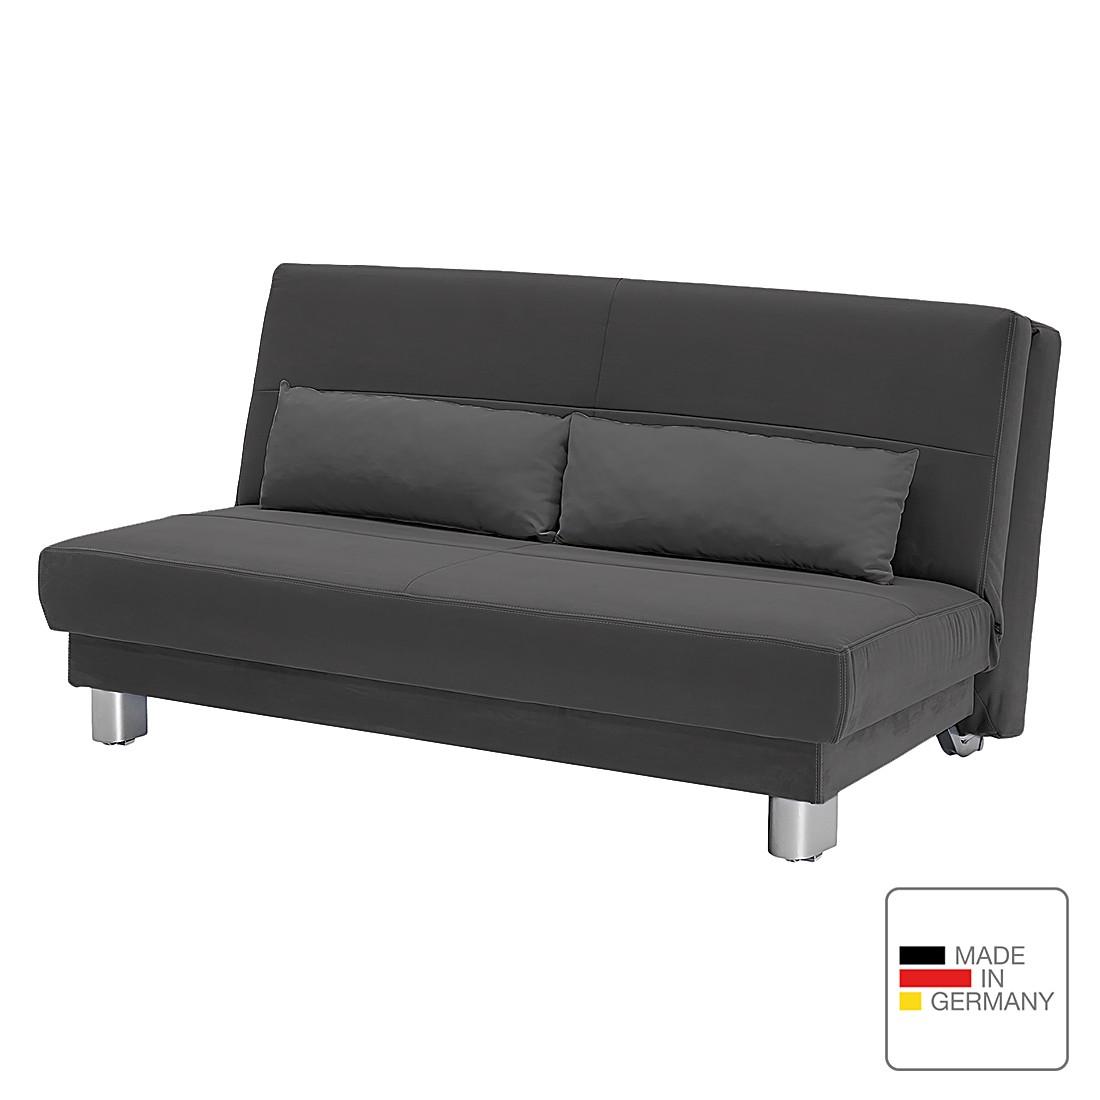 Schlafsofa Motard – Flachgewebe – Grau – 158 cm, Studio Monroe günstig kaufen